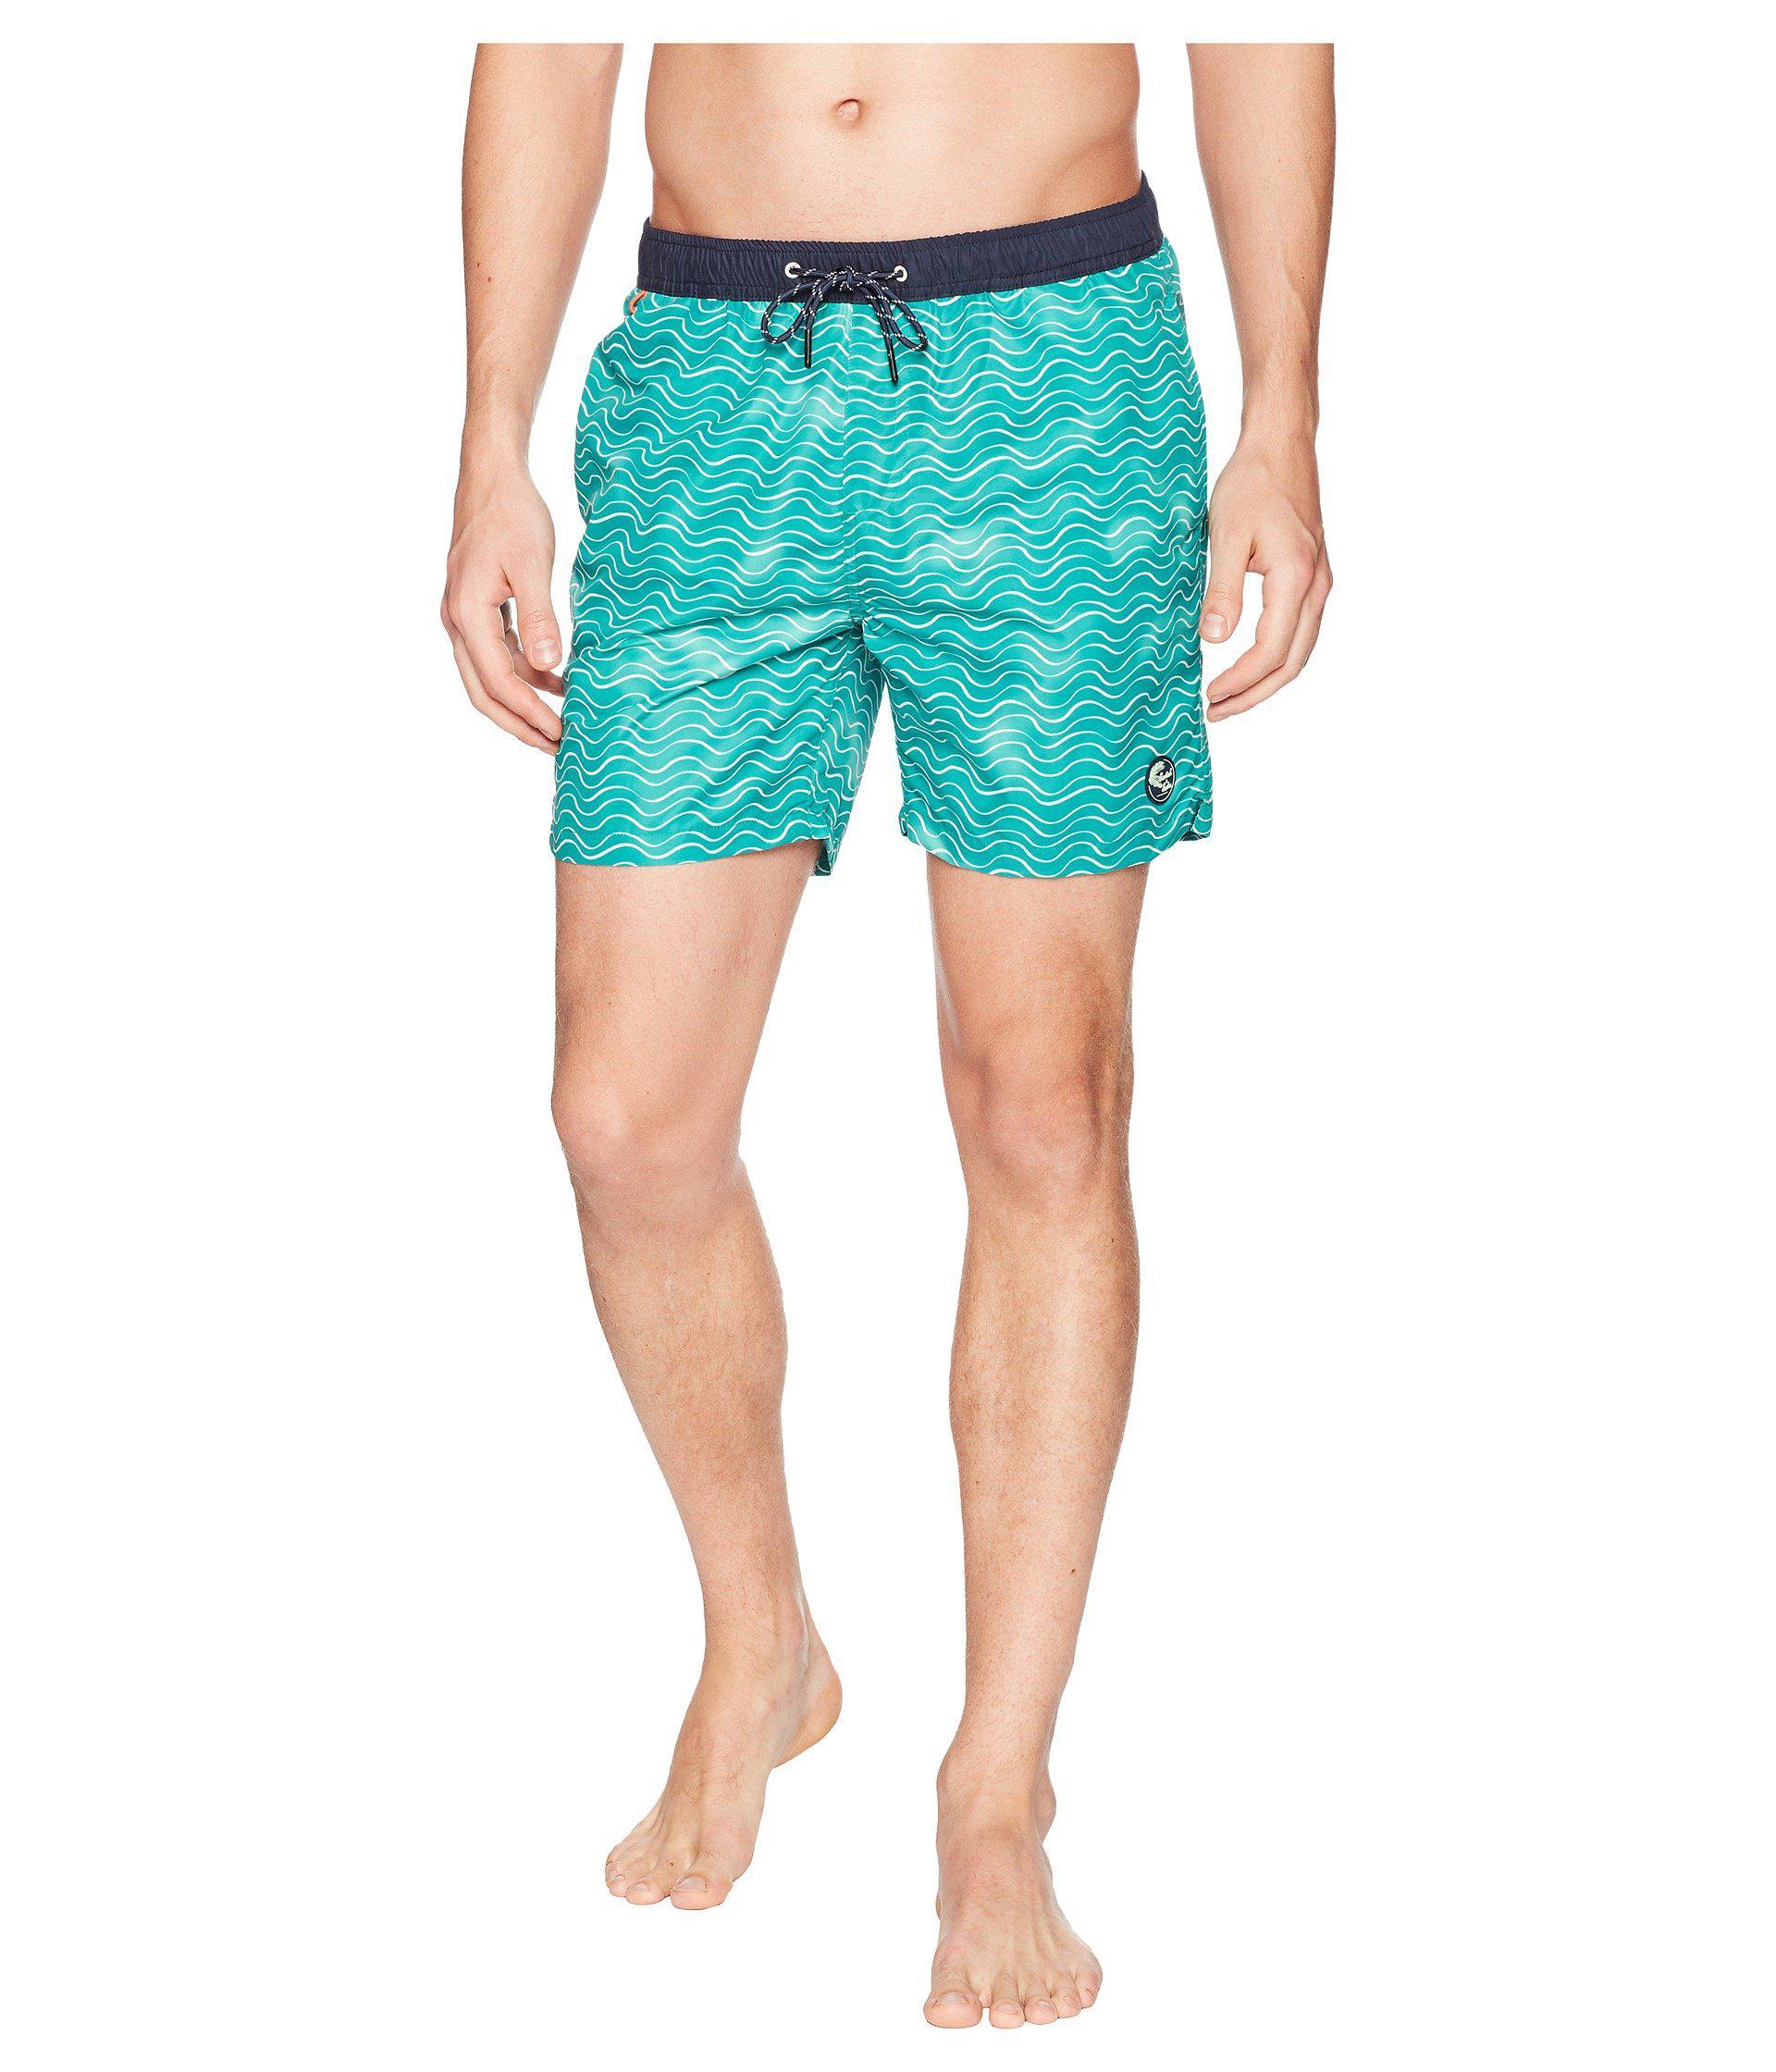 219c1a8d36 Lyst - Scotch & Soda Classic Swim Shorts With Fresh Two-tone All ...